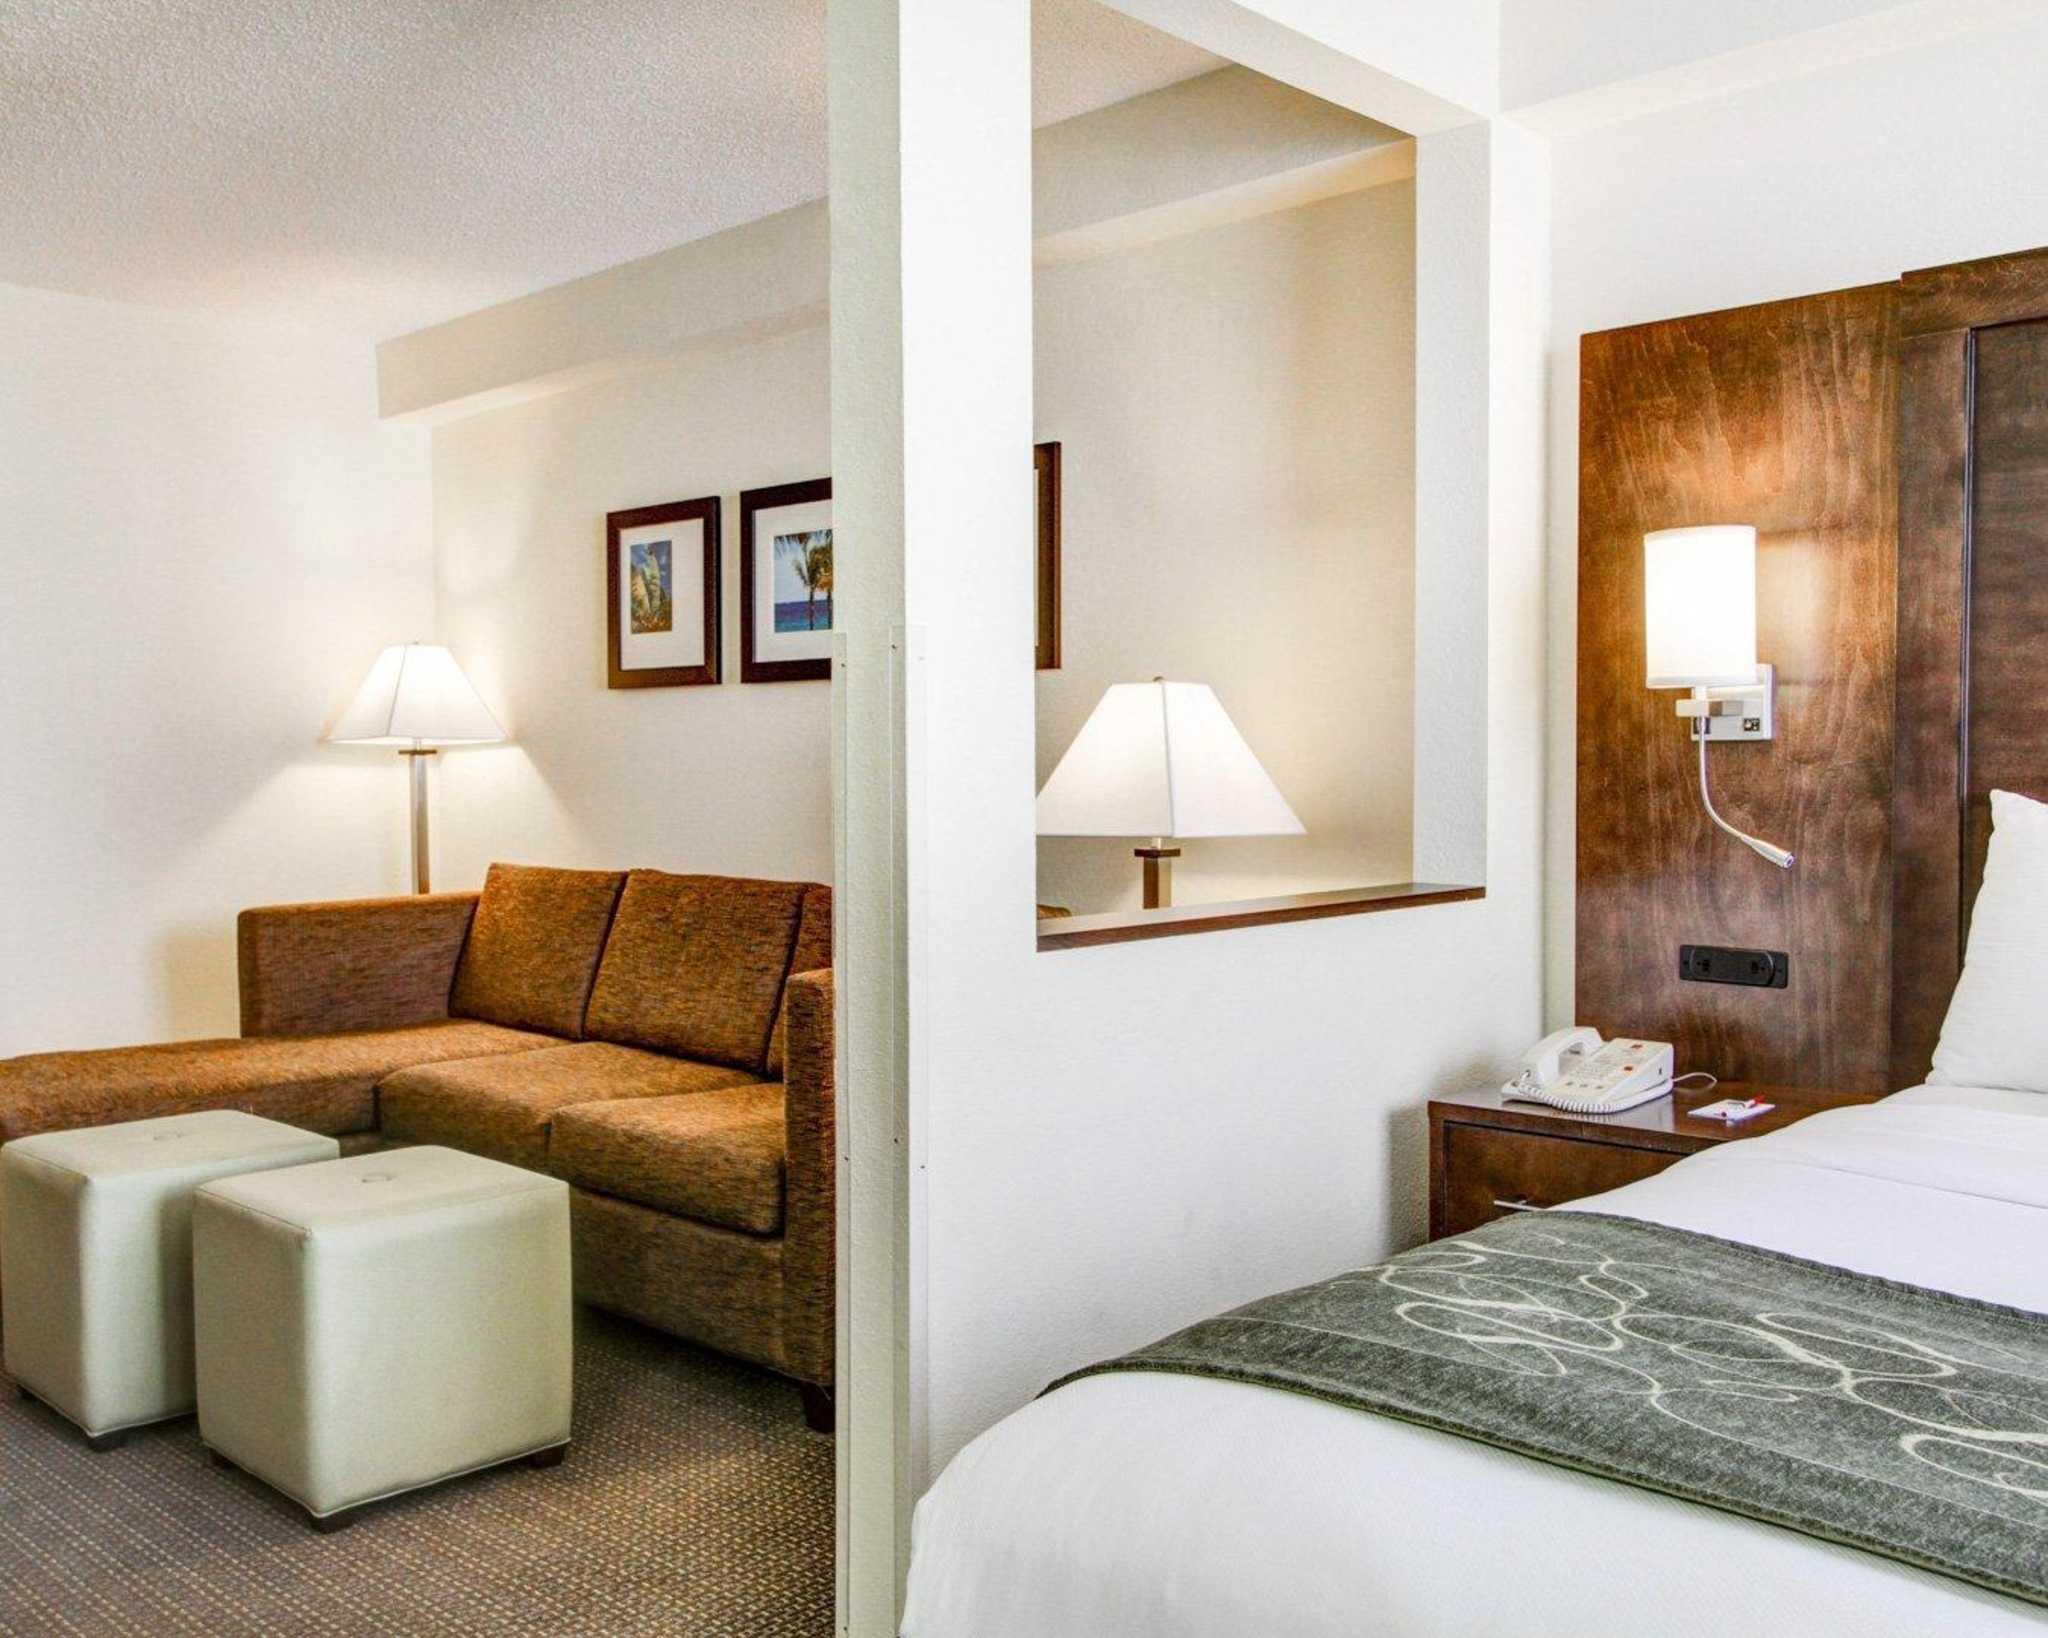 Comfort Suites Weston - Sawgrass Mills South image 27